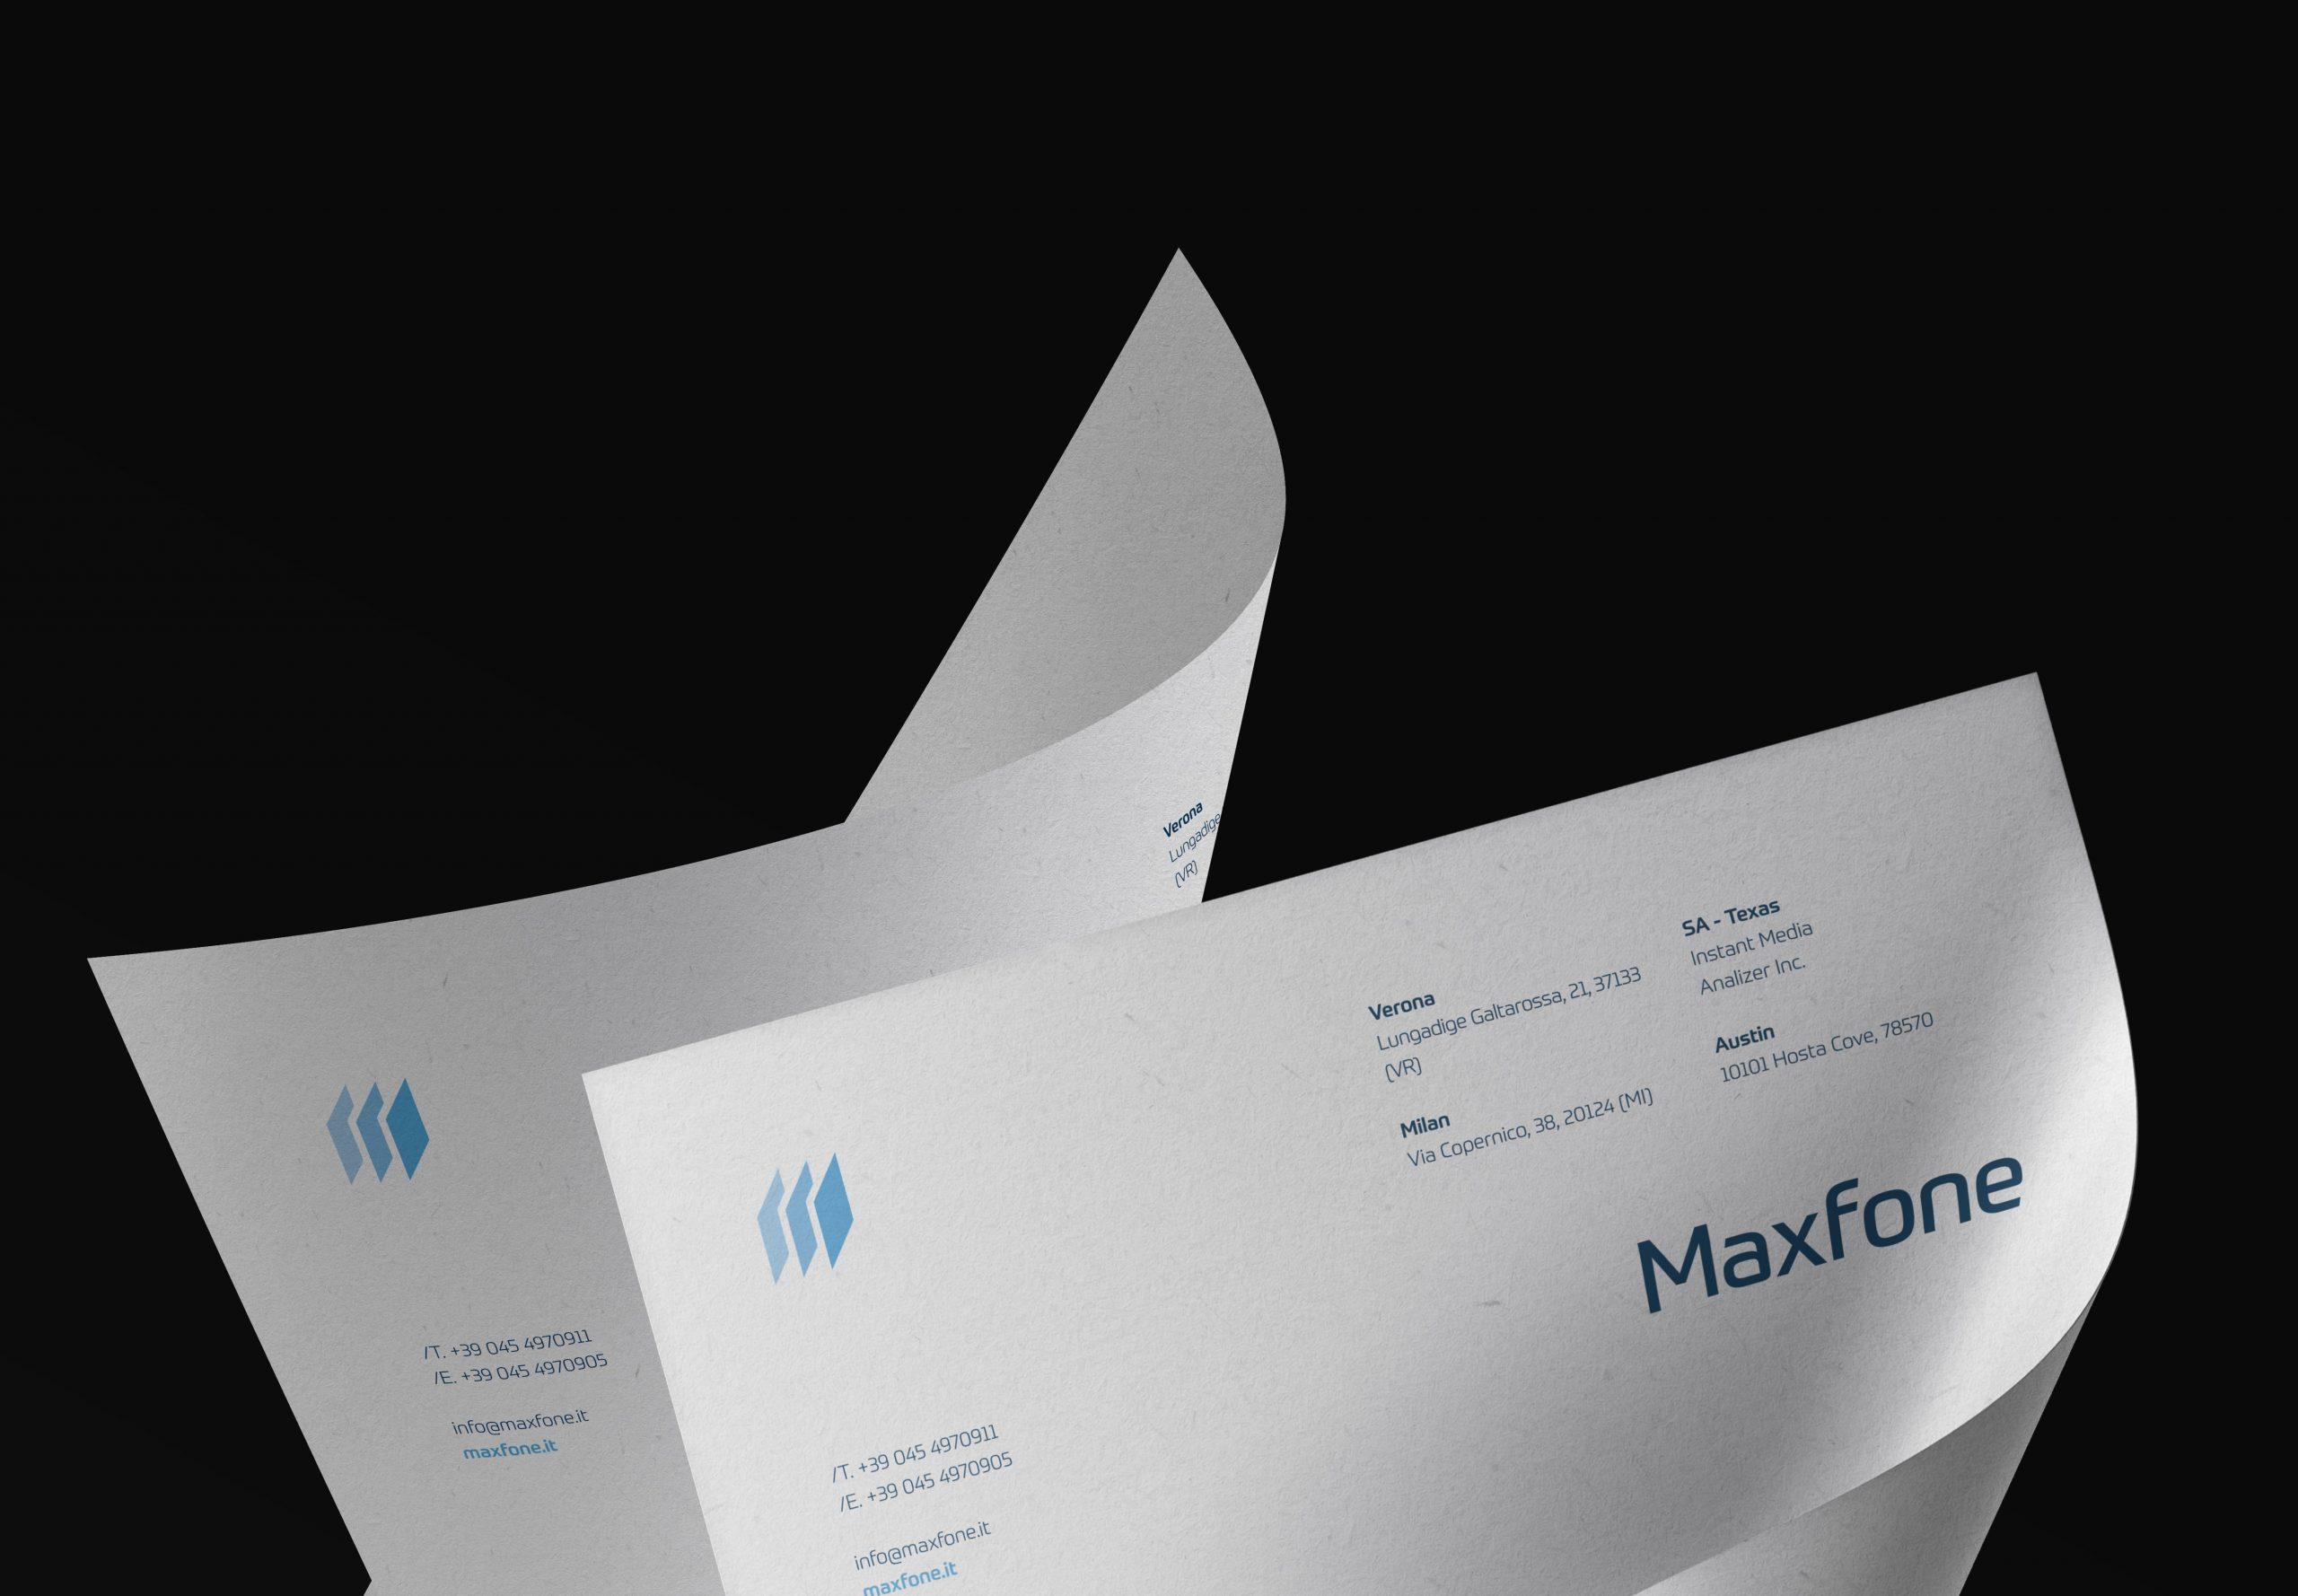 Maxfone Letterhead